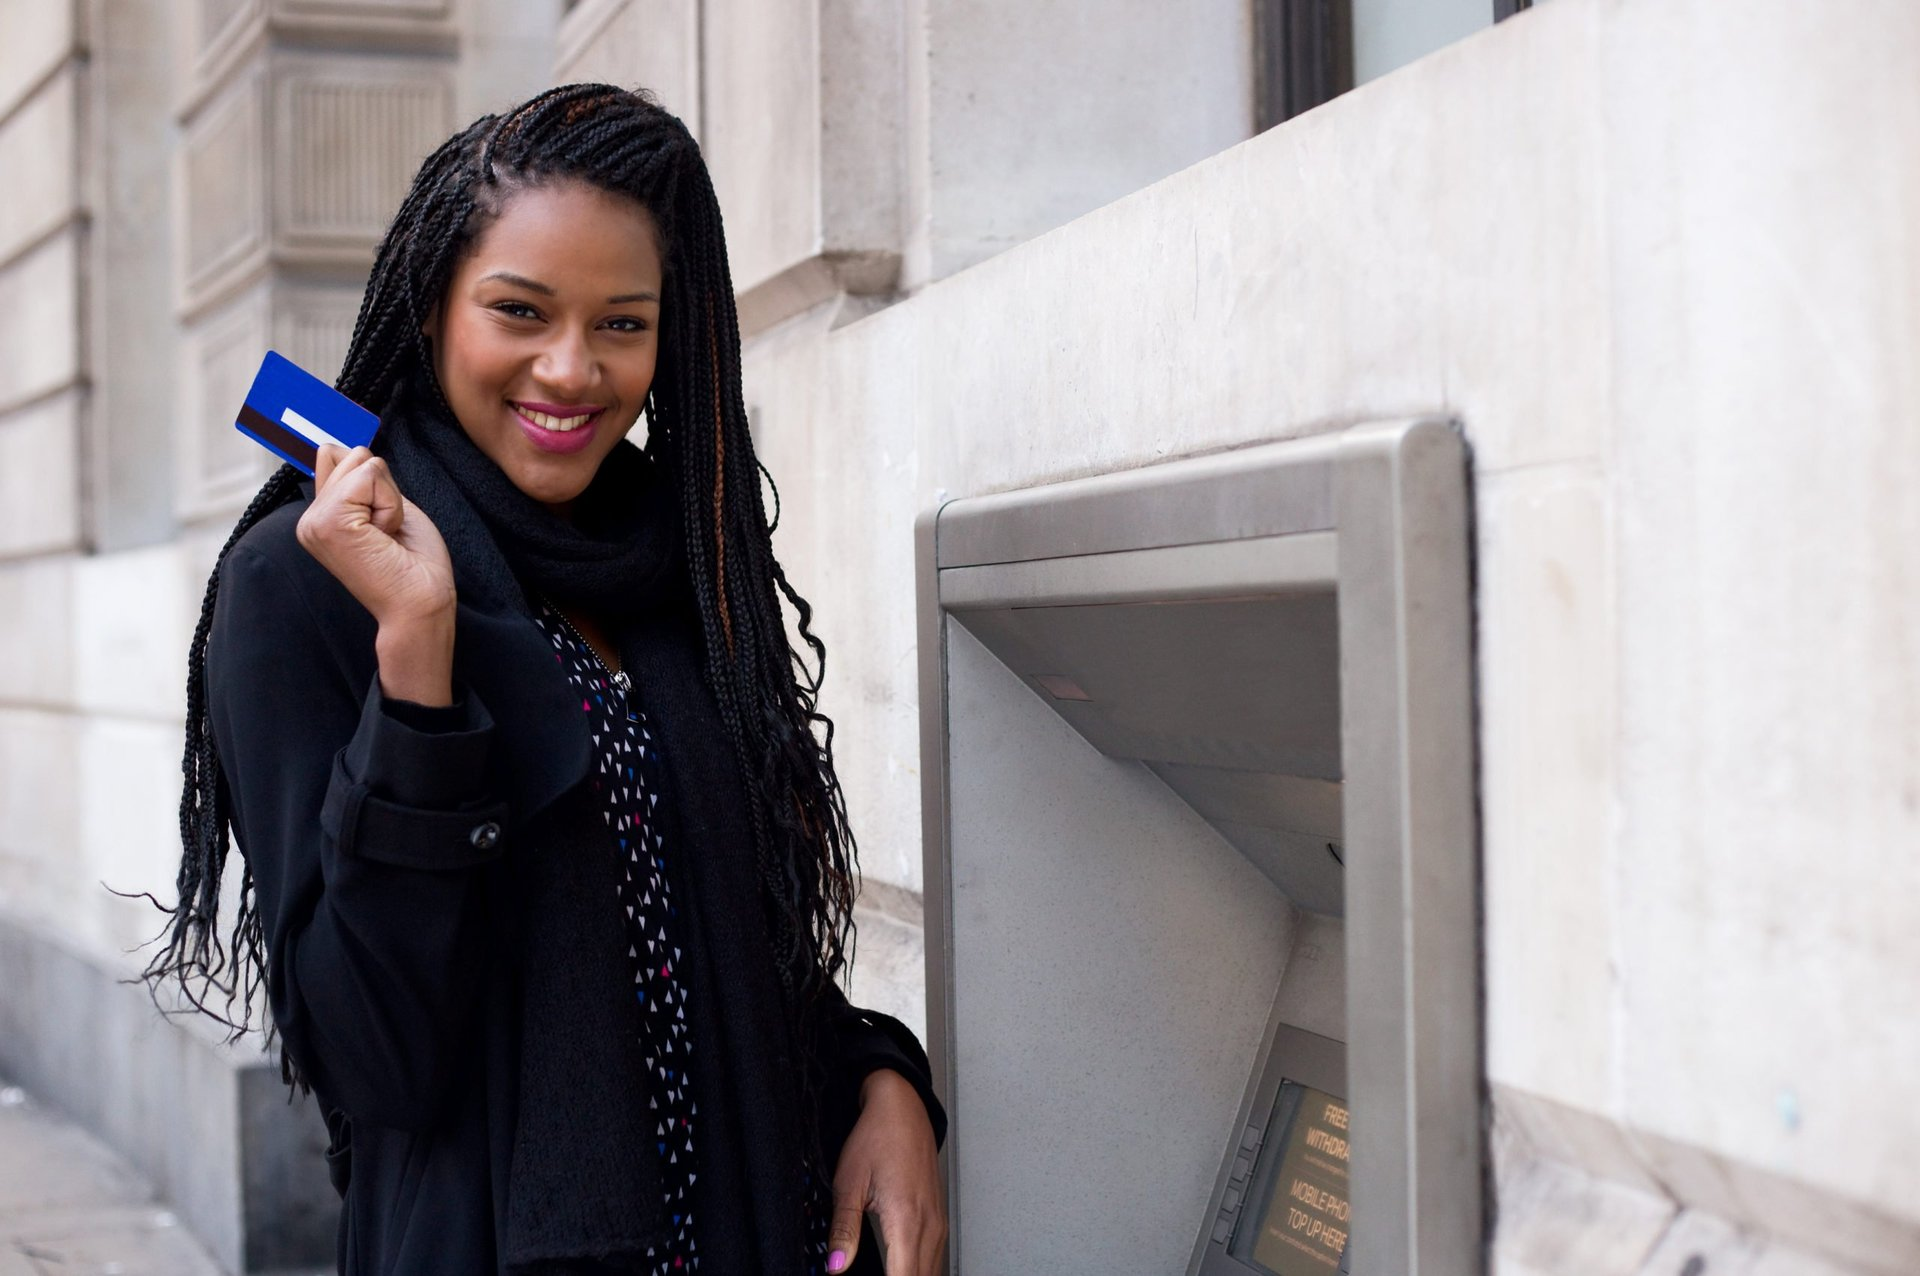 Woman using a debit card at an ATM